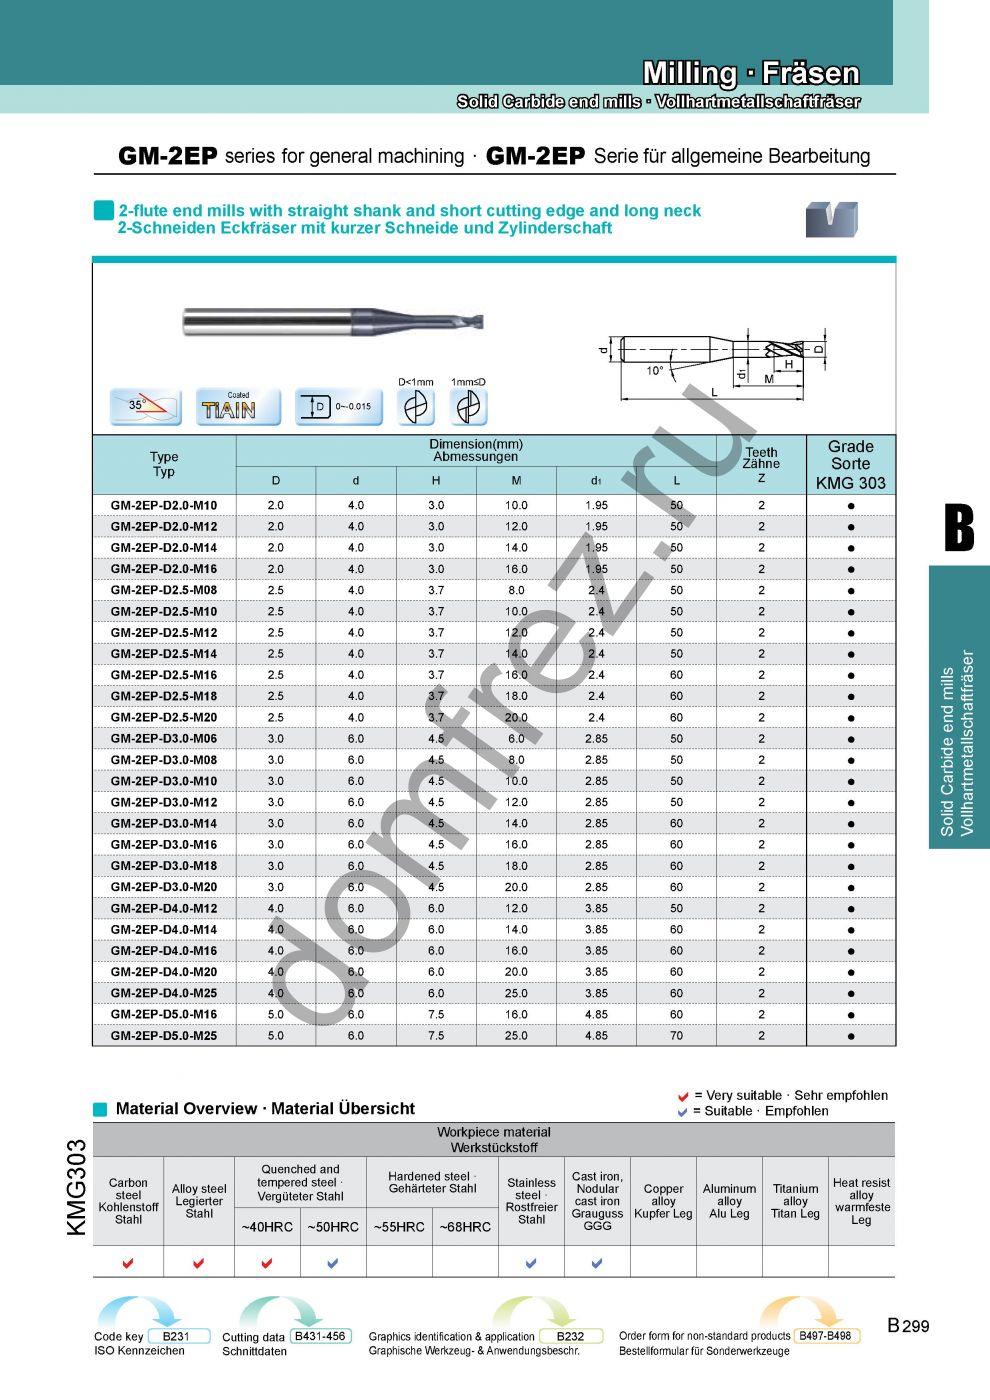 Фреза GM-2EP-D4.0-M16